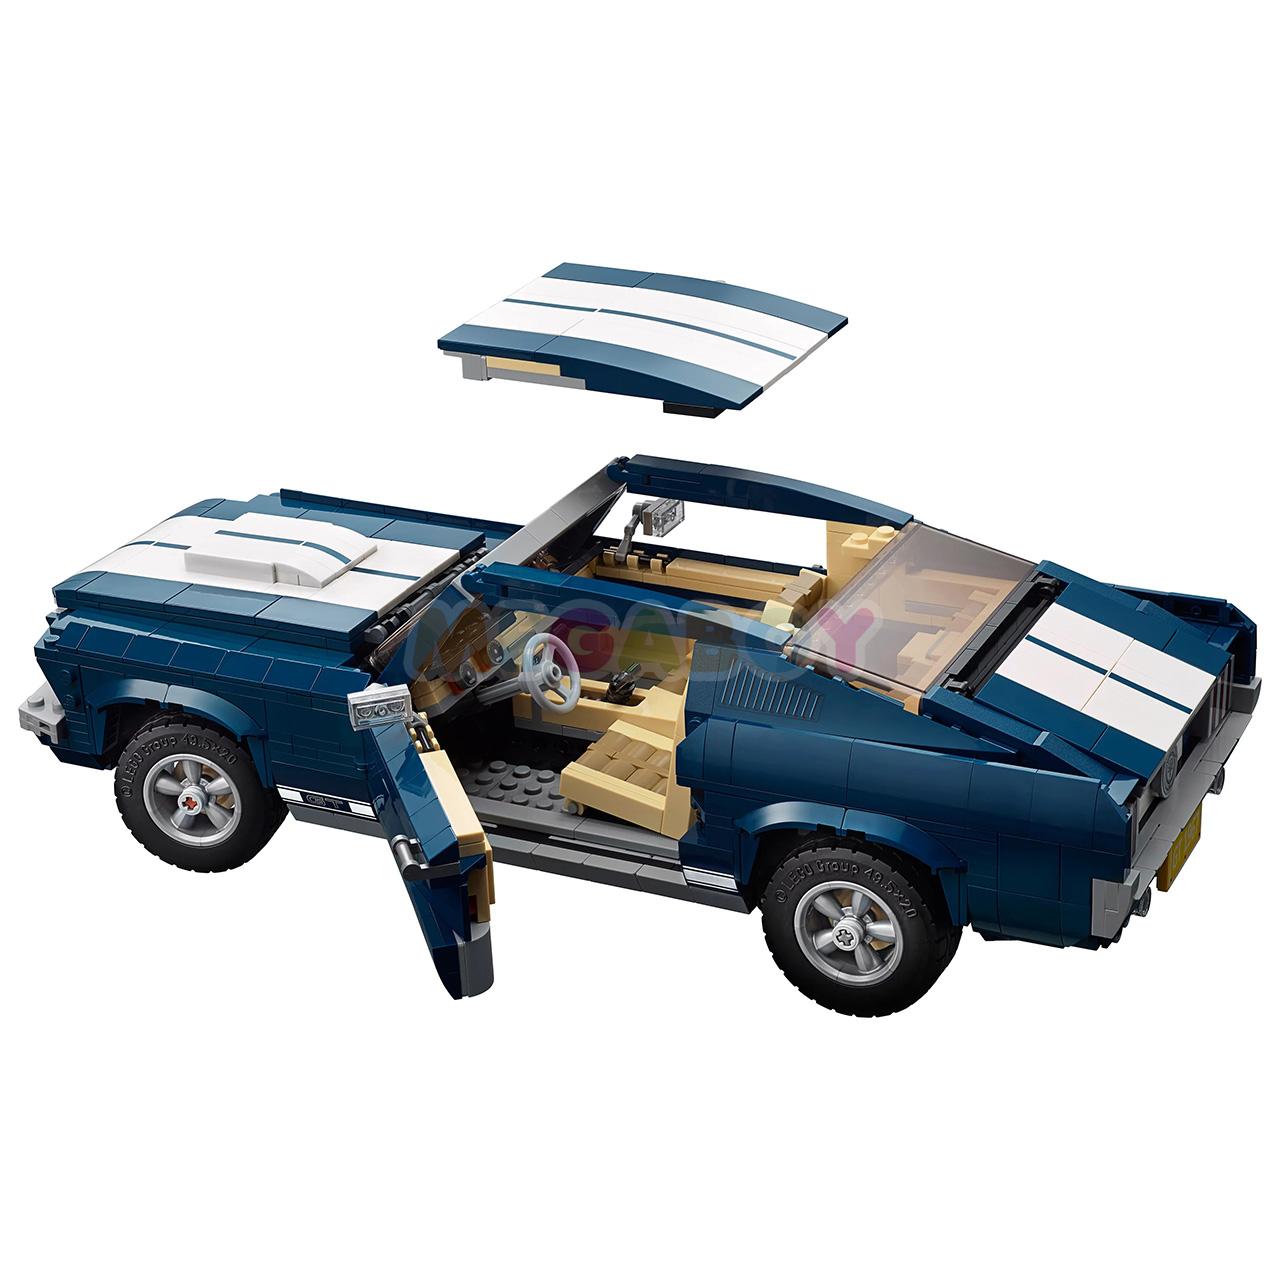 Lego 10265 ford mustang купить